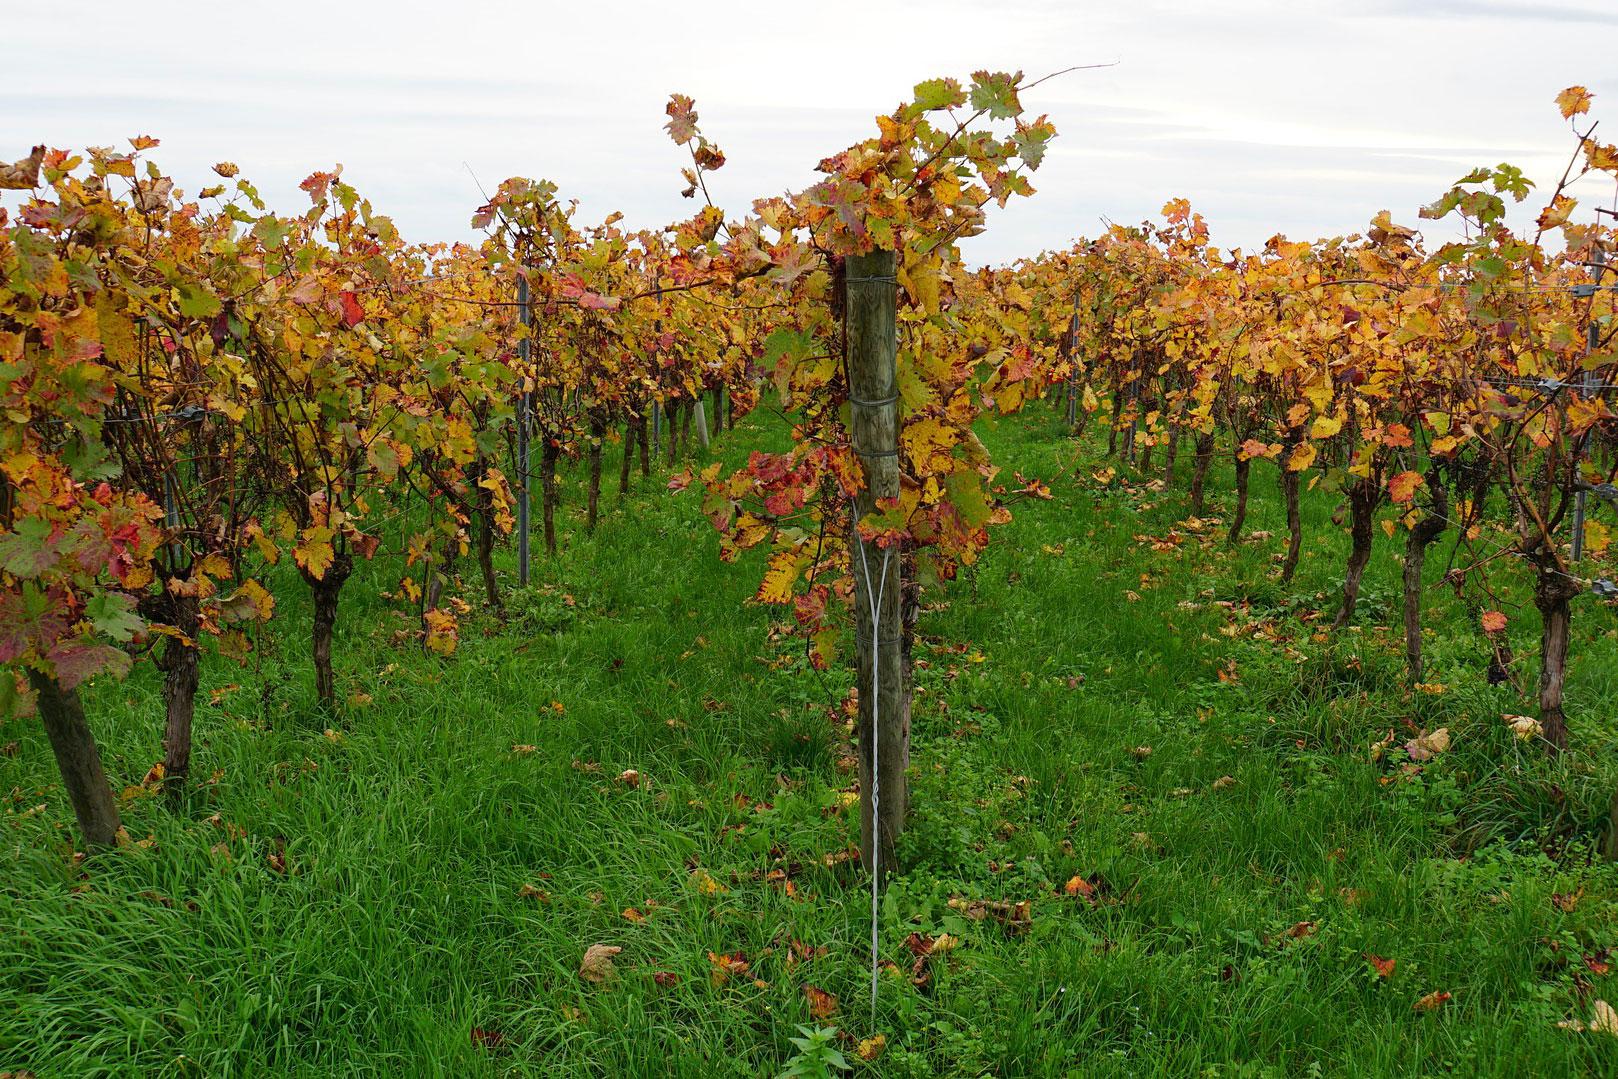 rendu-3-image-gratuite-internet-vineyard-4586452_1920